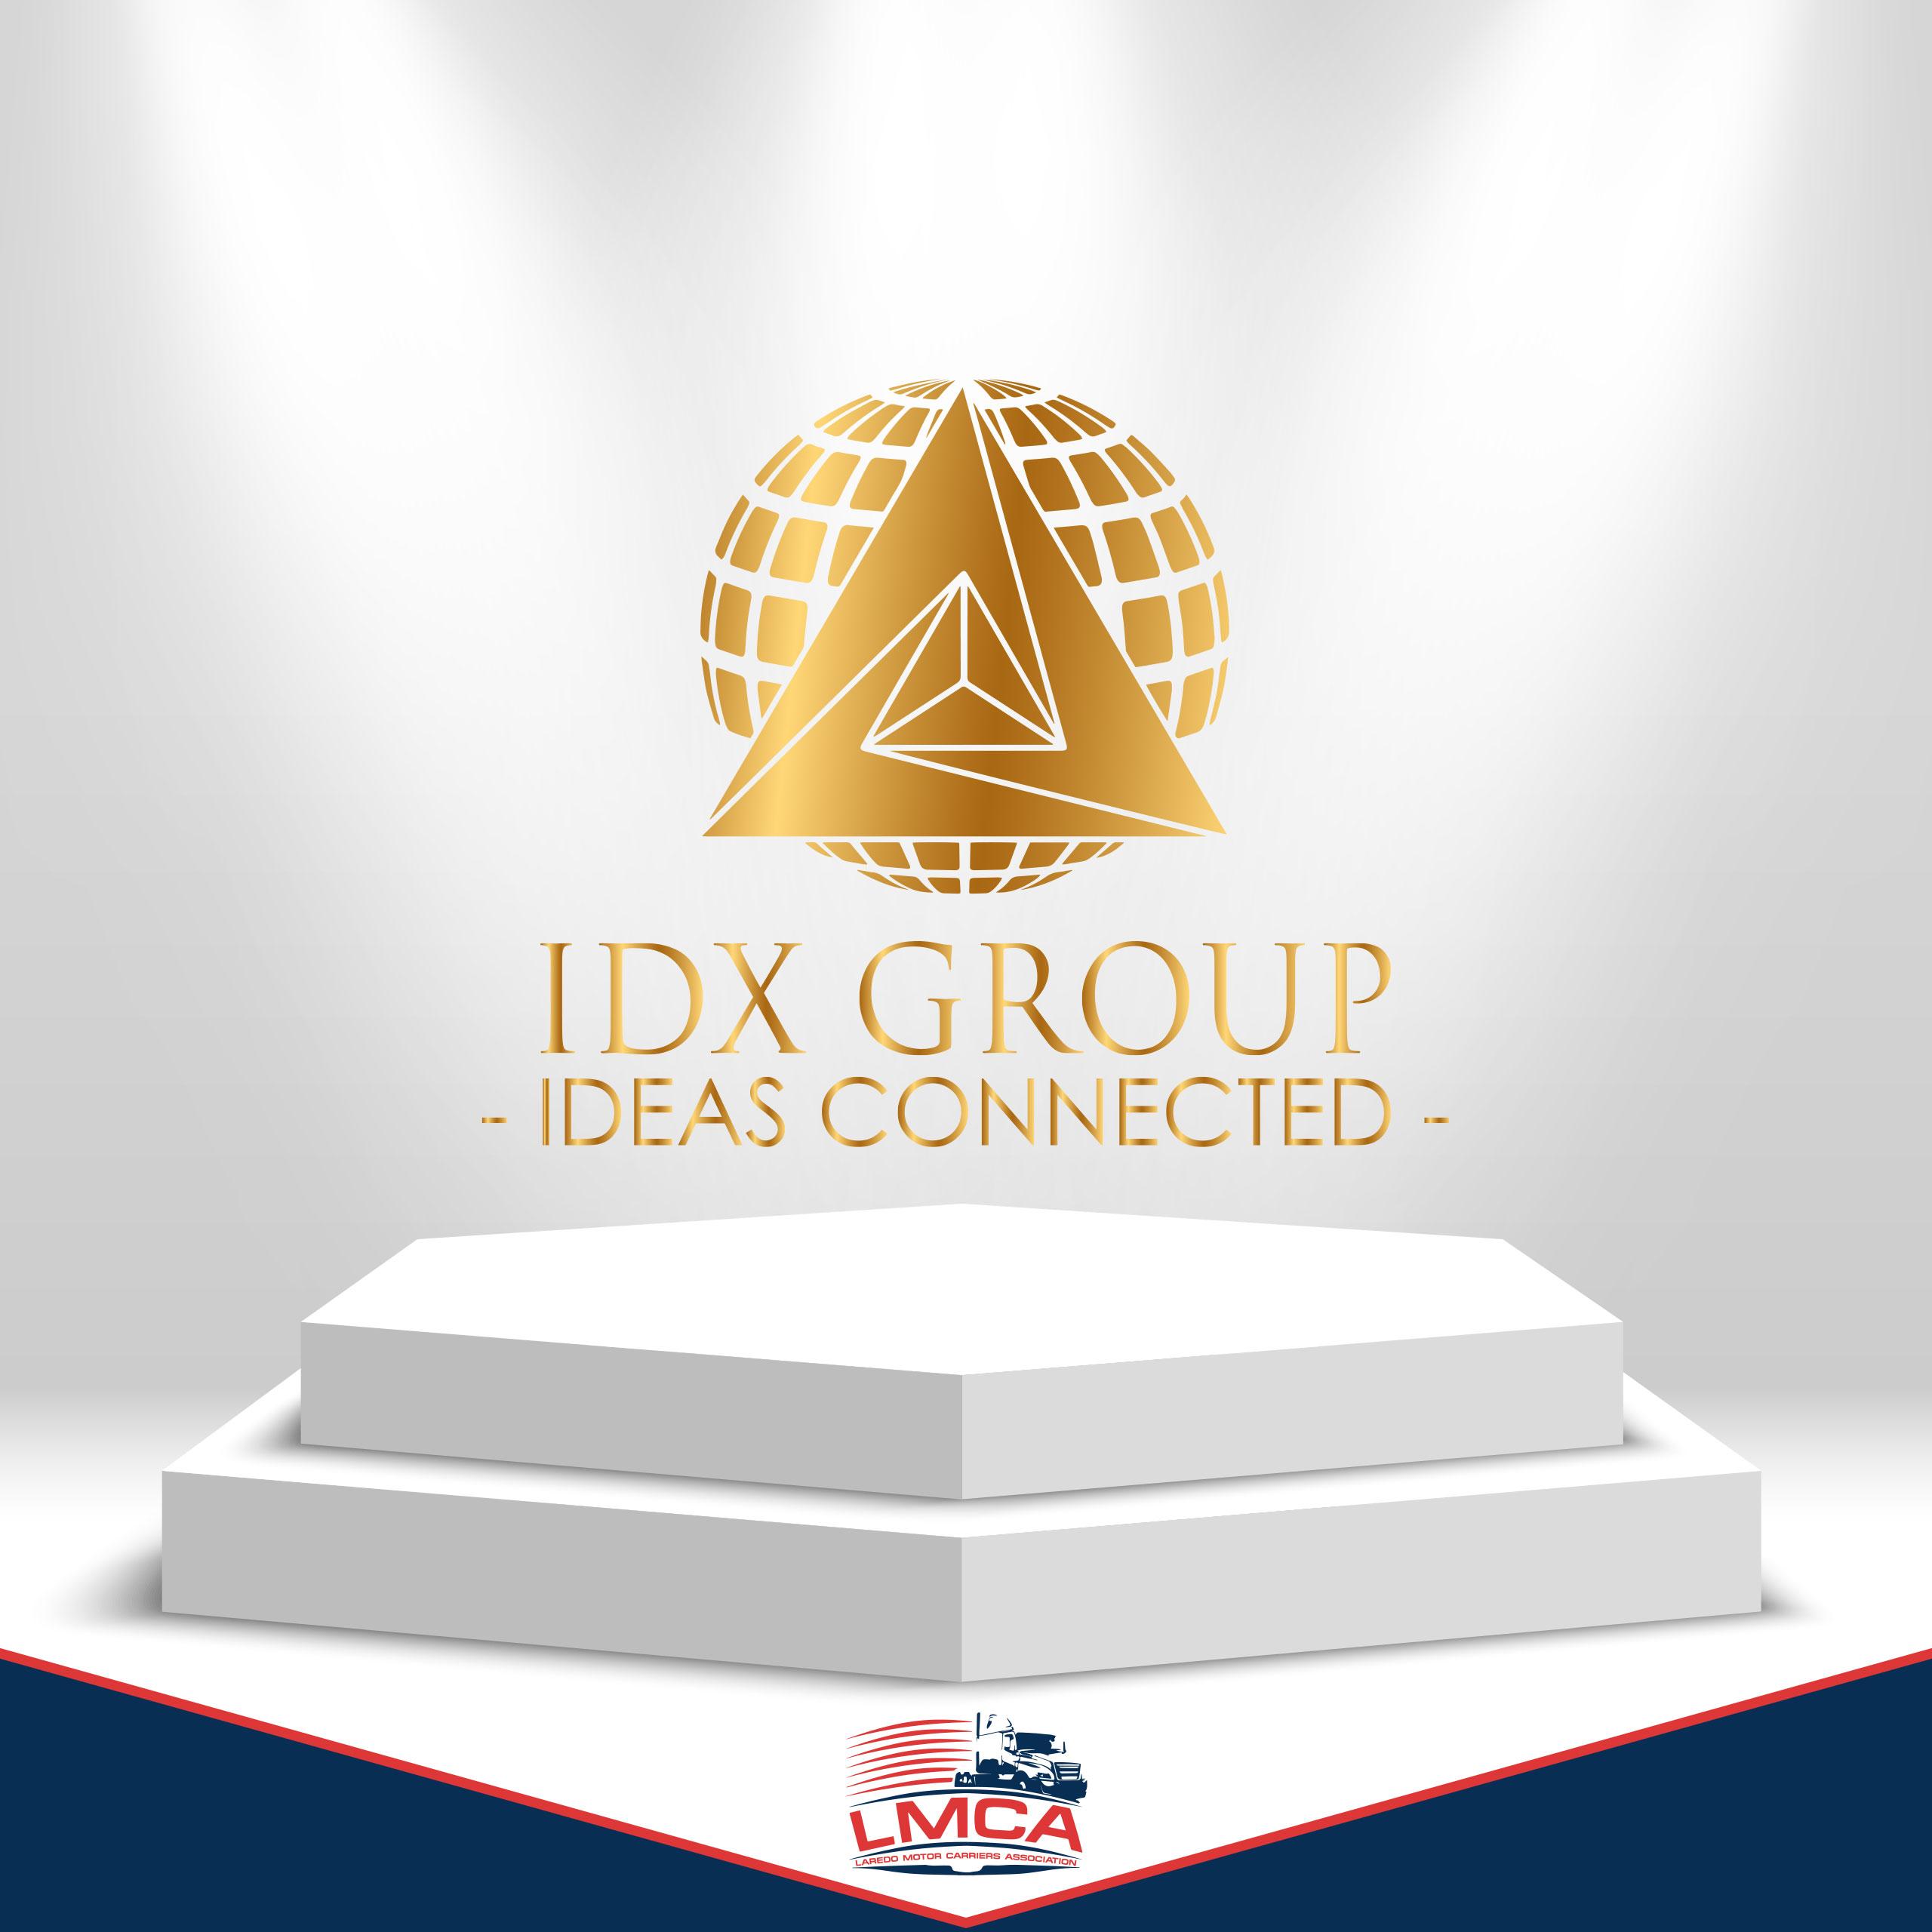 idxgroupllc